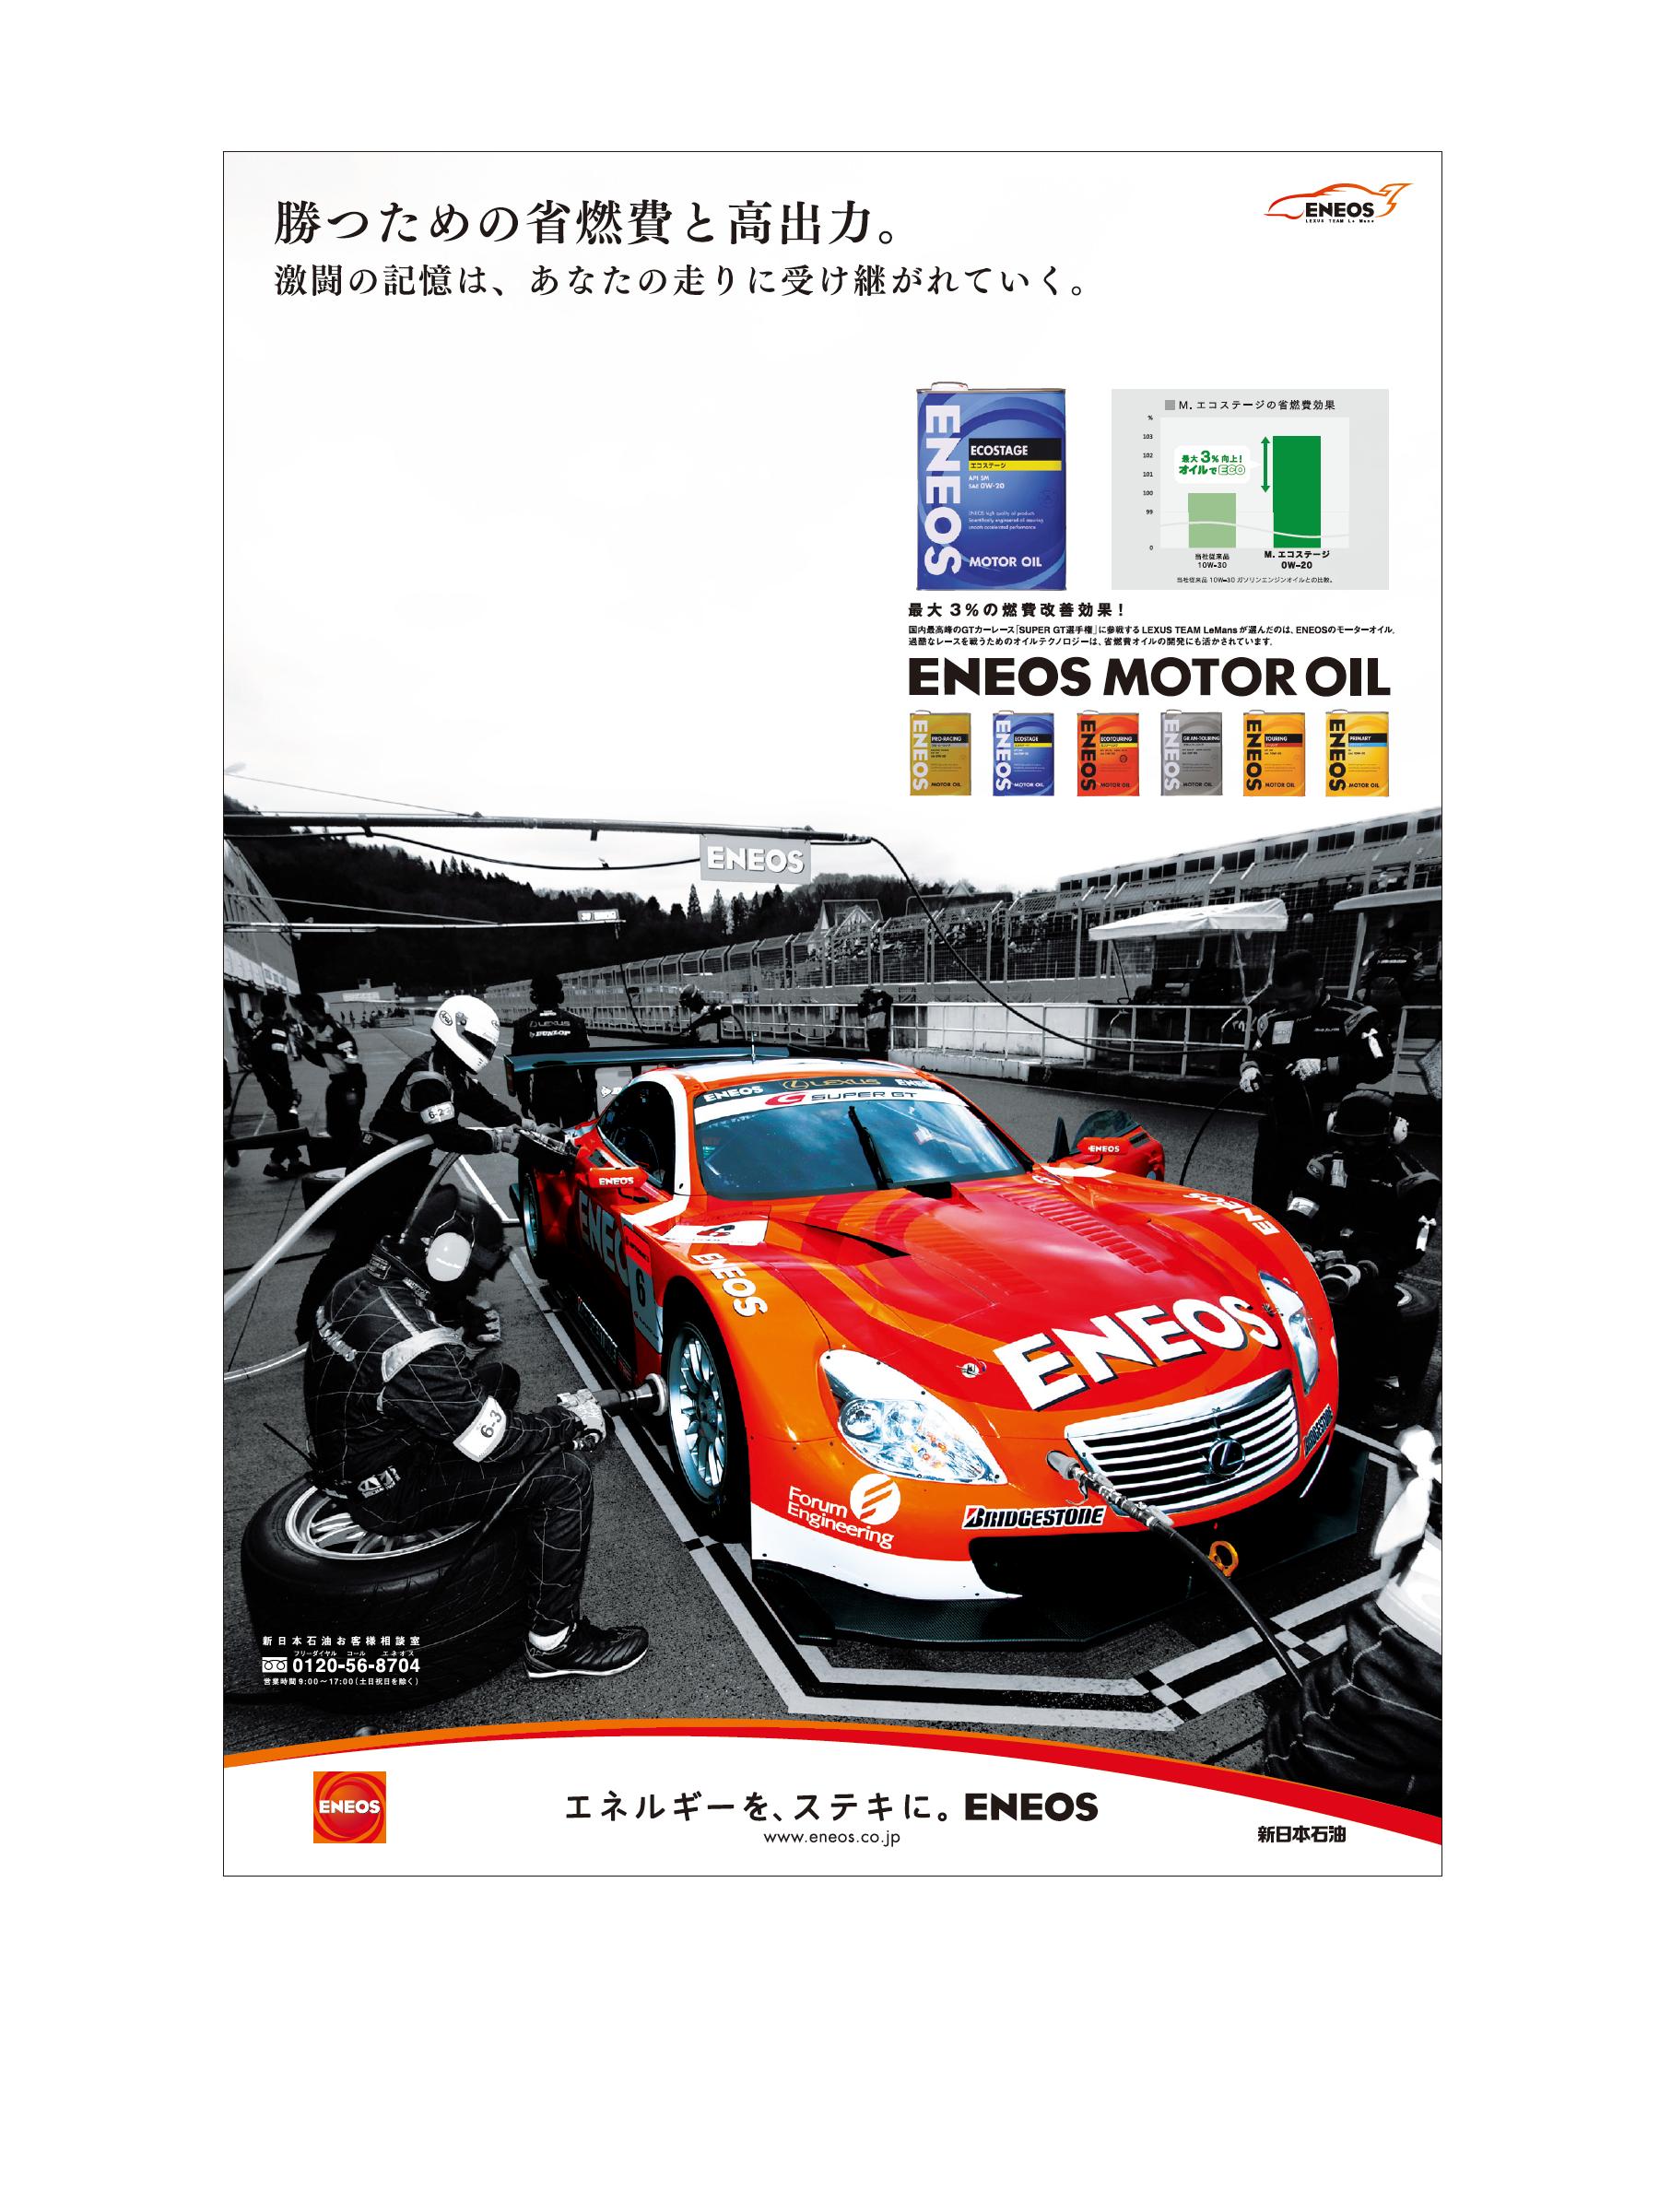 ENEOS MOTOR OIL ポスター(B1)/雑誌広告